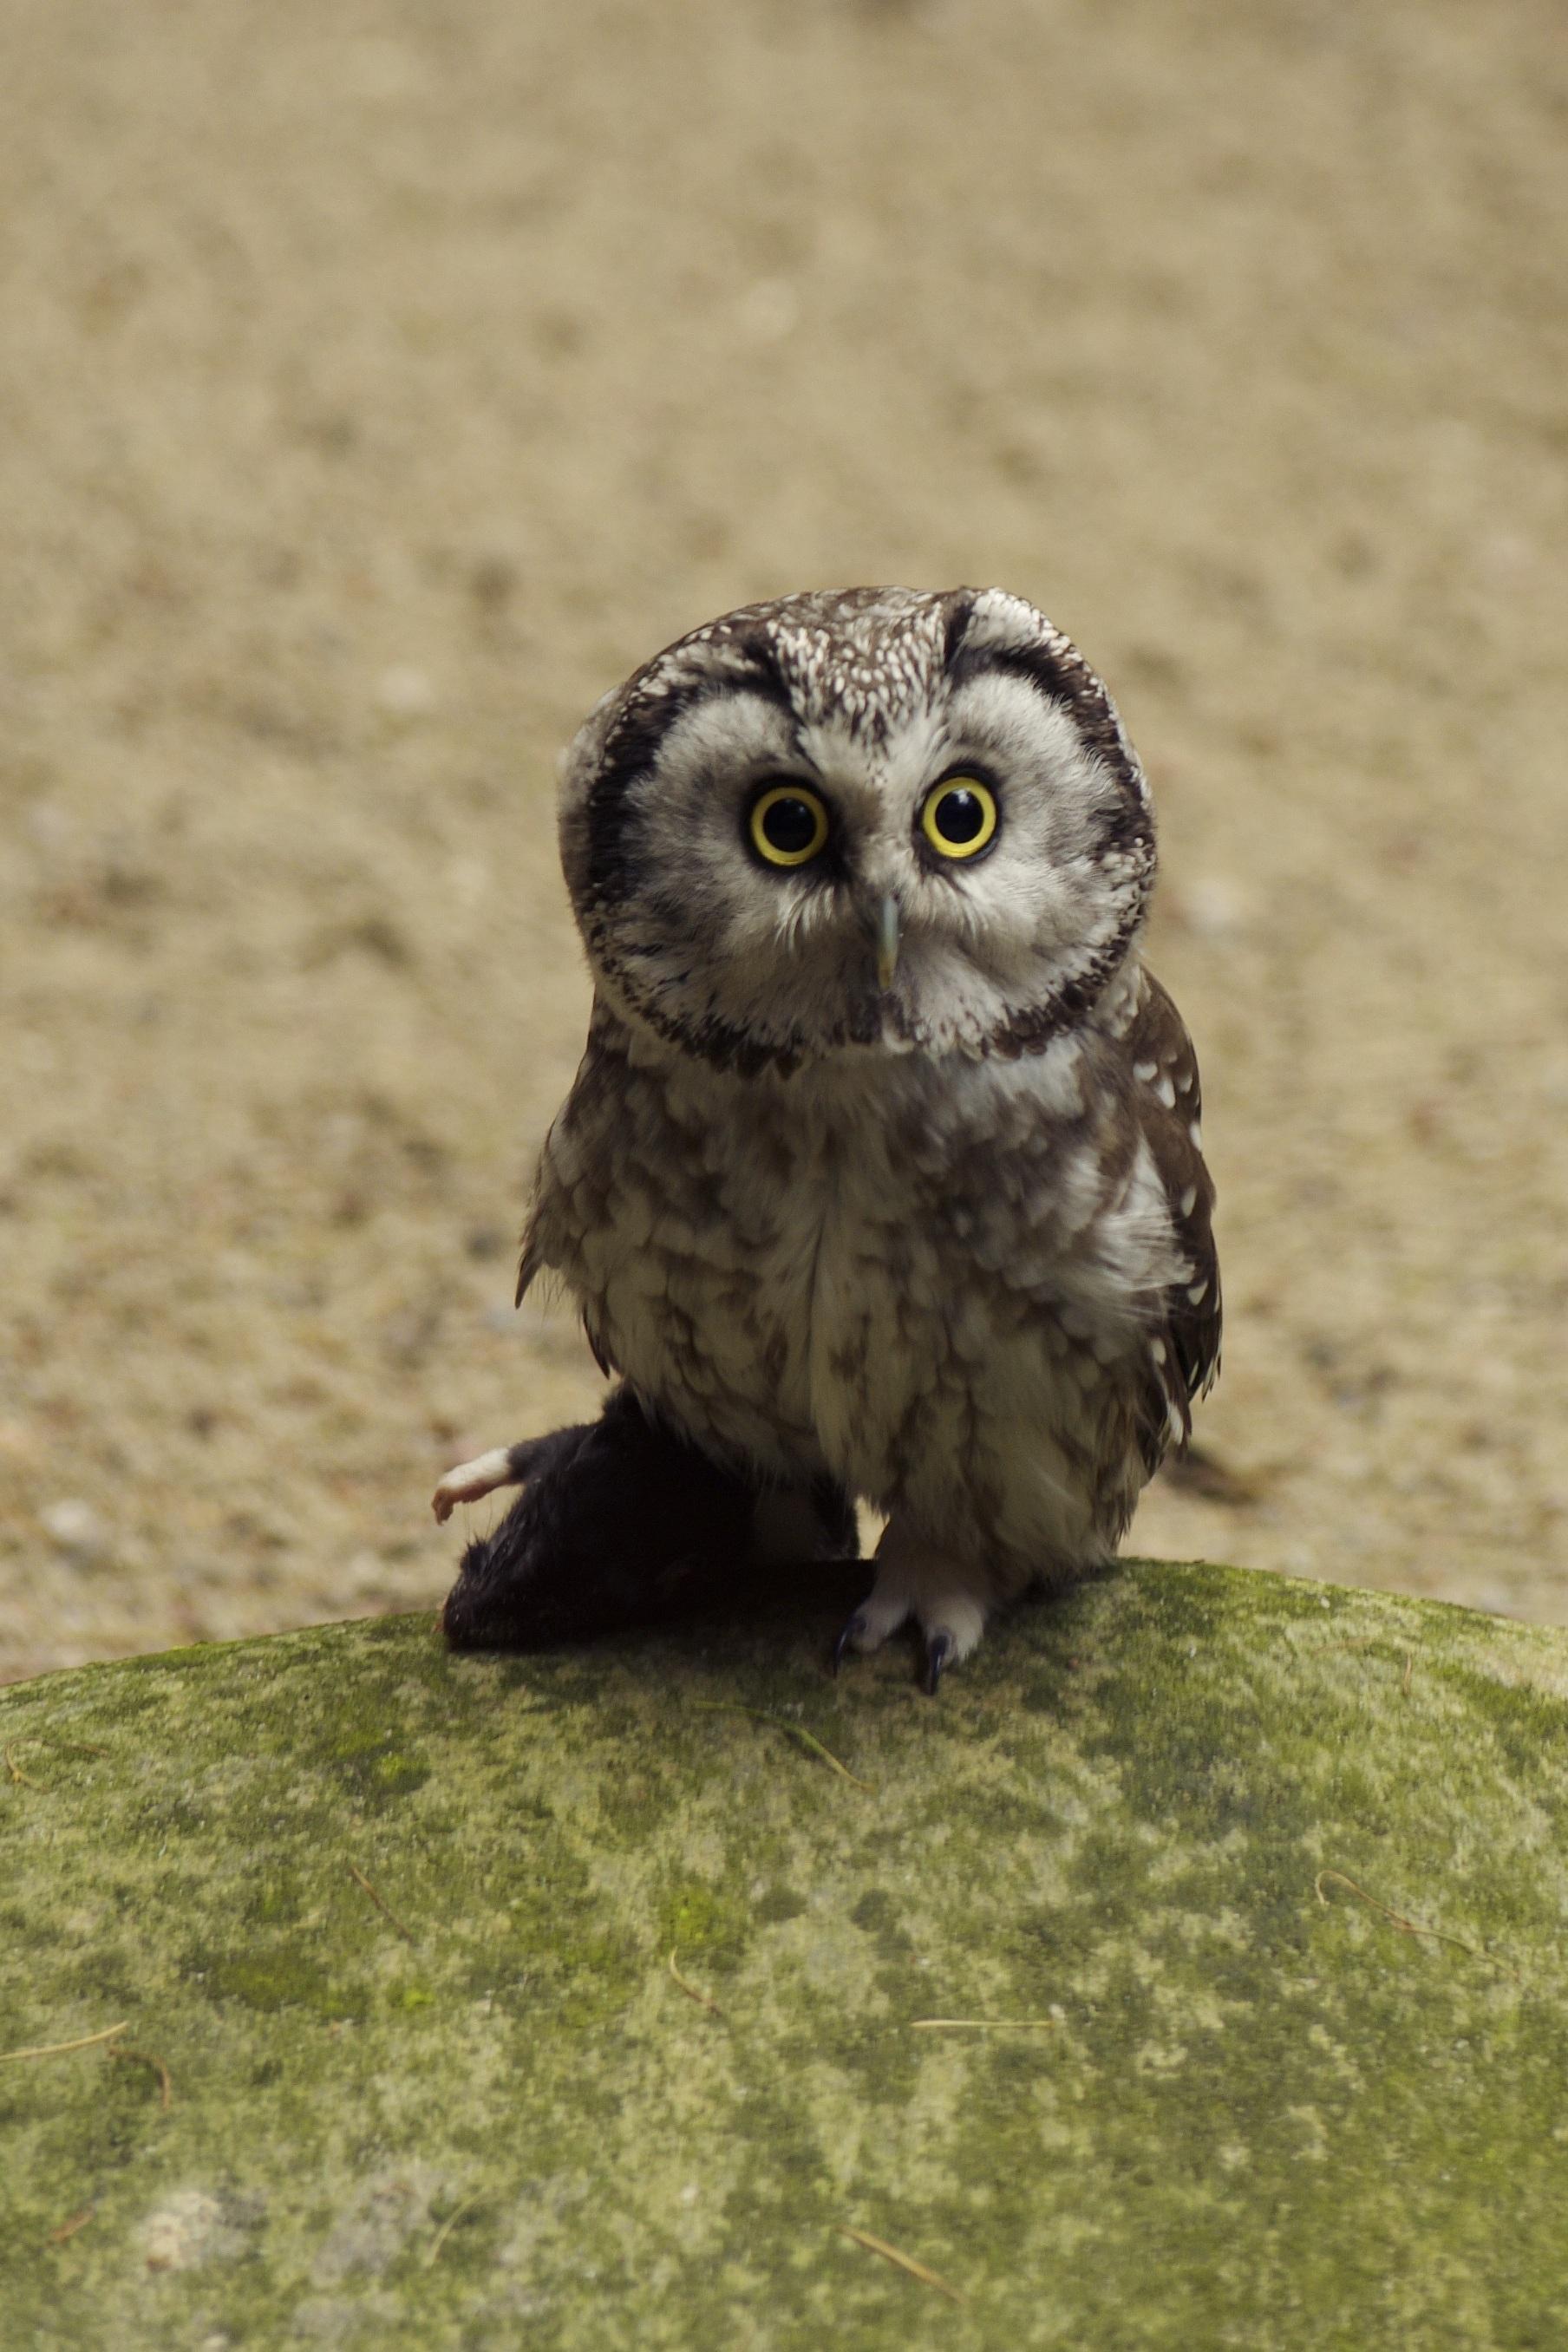 Save Big Bird >> Eurasian Pygmy Owl - Glaucidium passerinum image - Free stock photo - Public Domain photo - CC0 ...